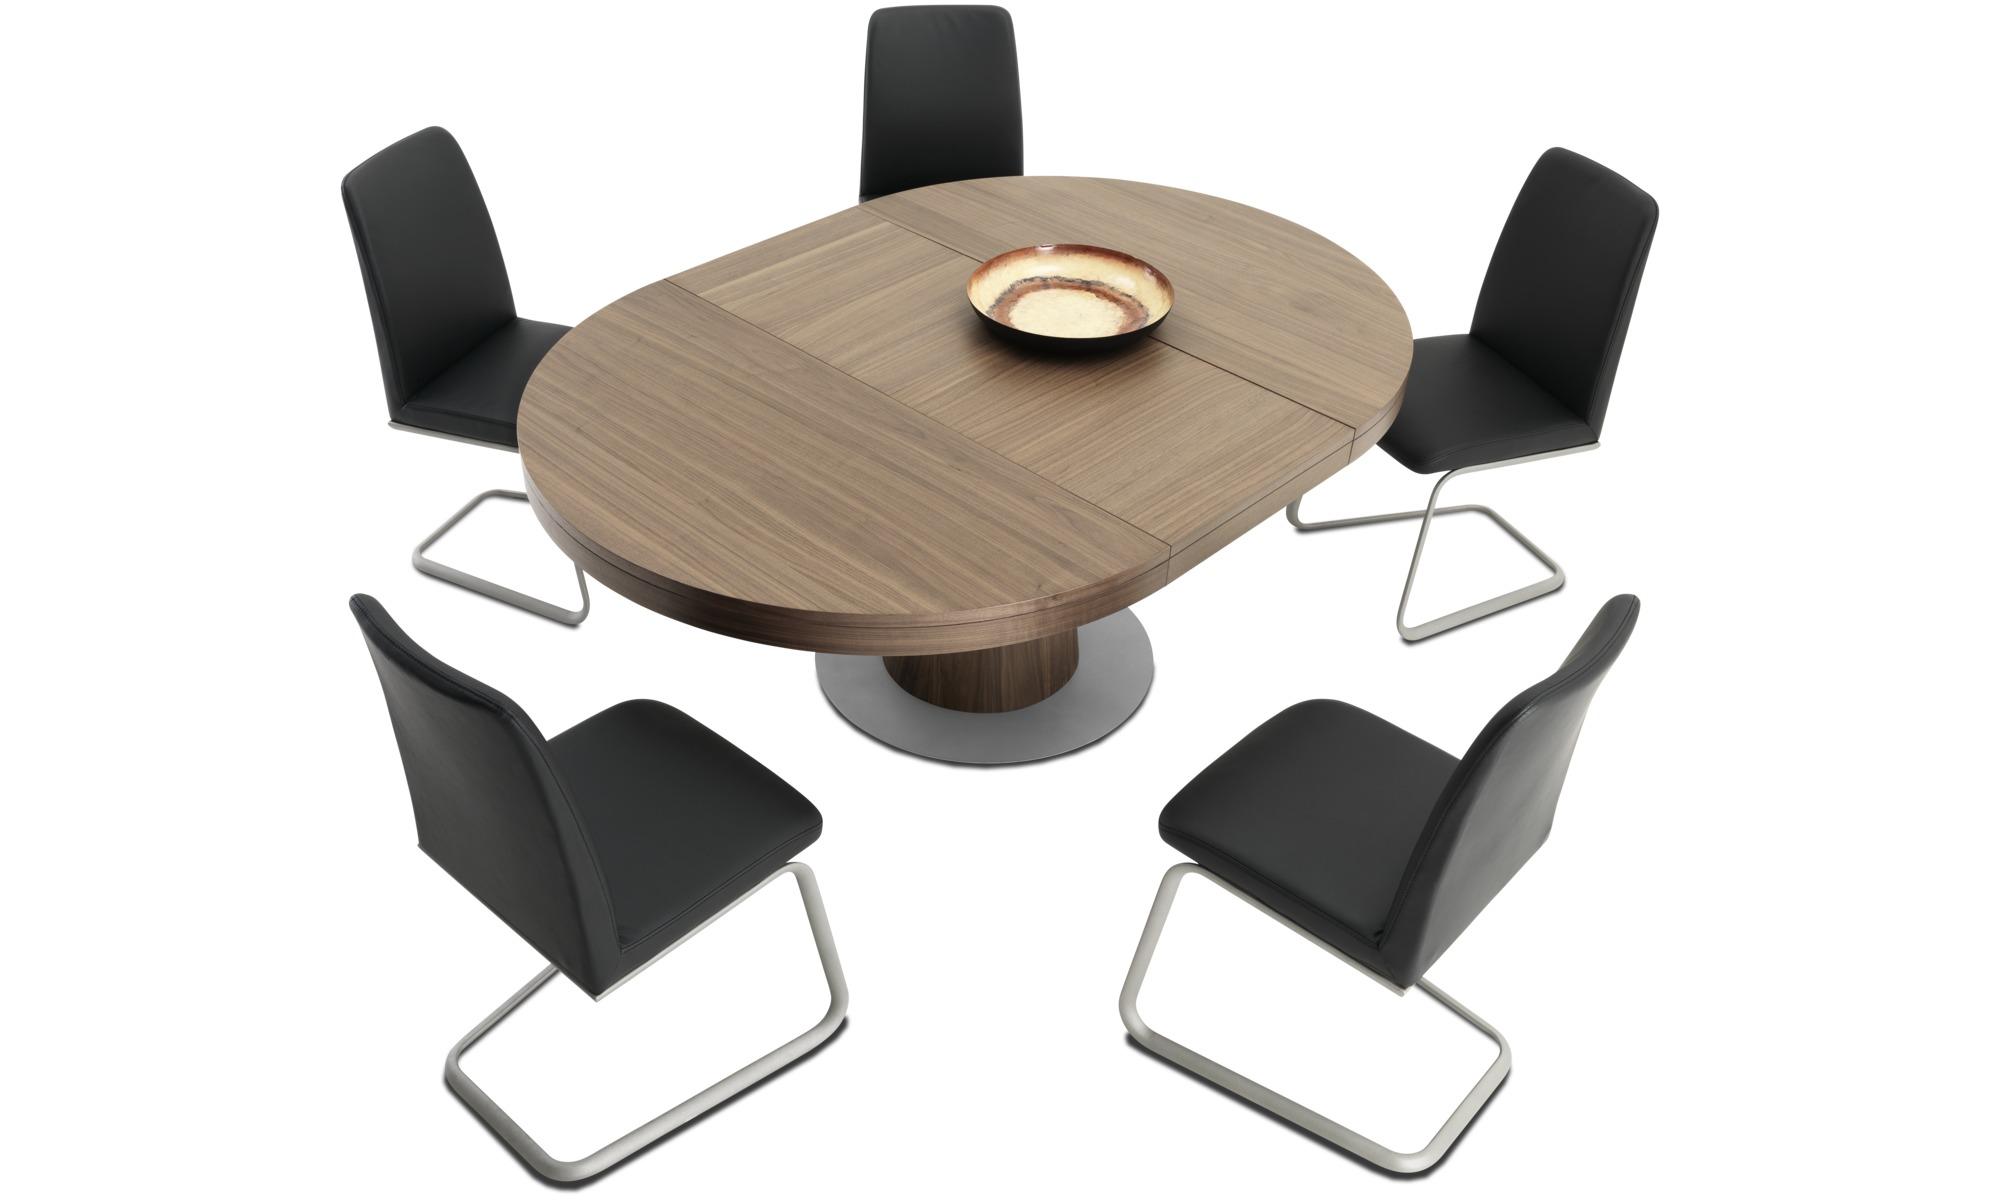 Fabelaktig Dining tables - Granada table with supplementary tabletop - BoConcept VN-45